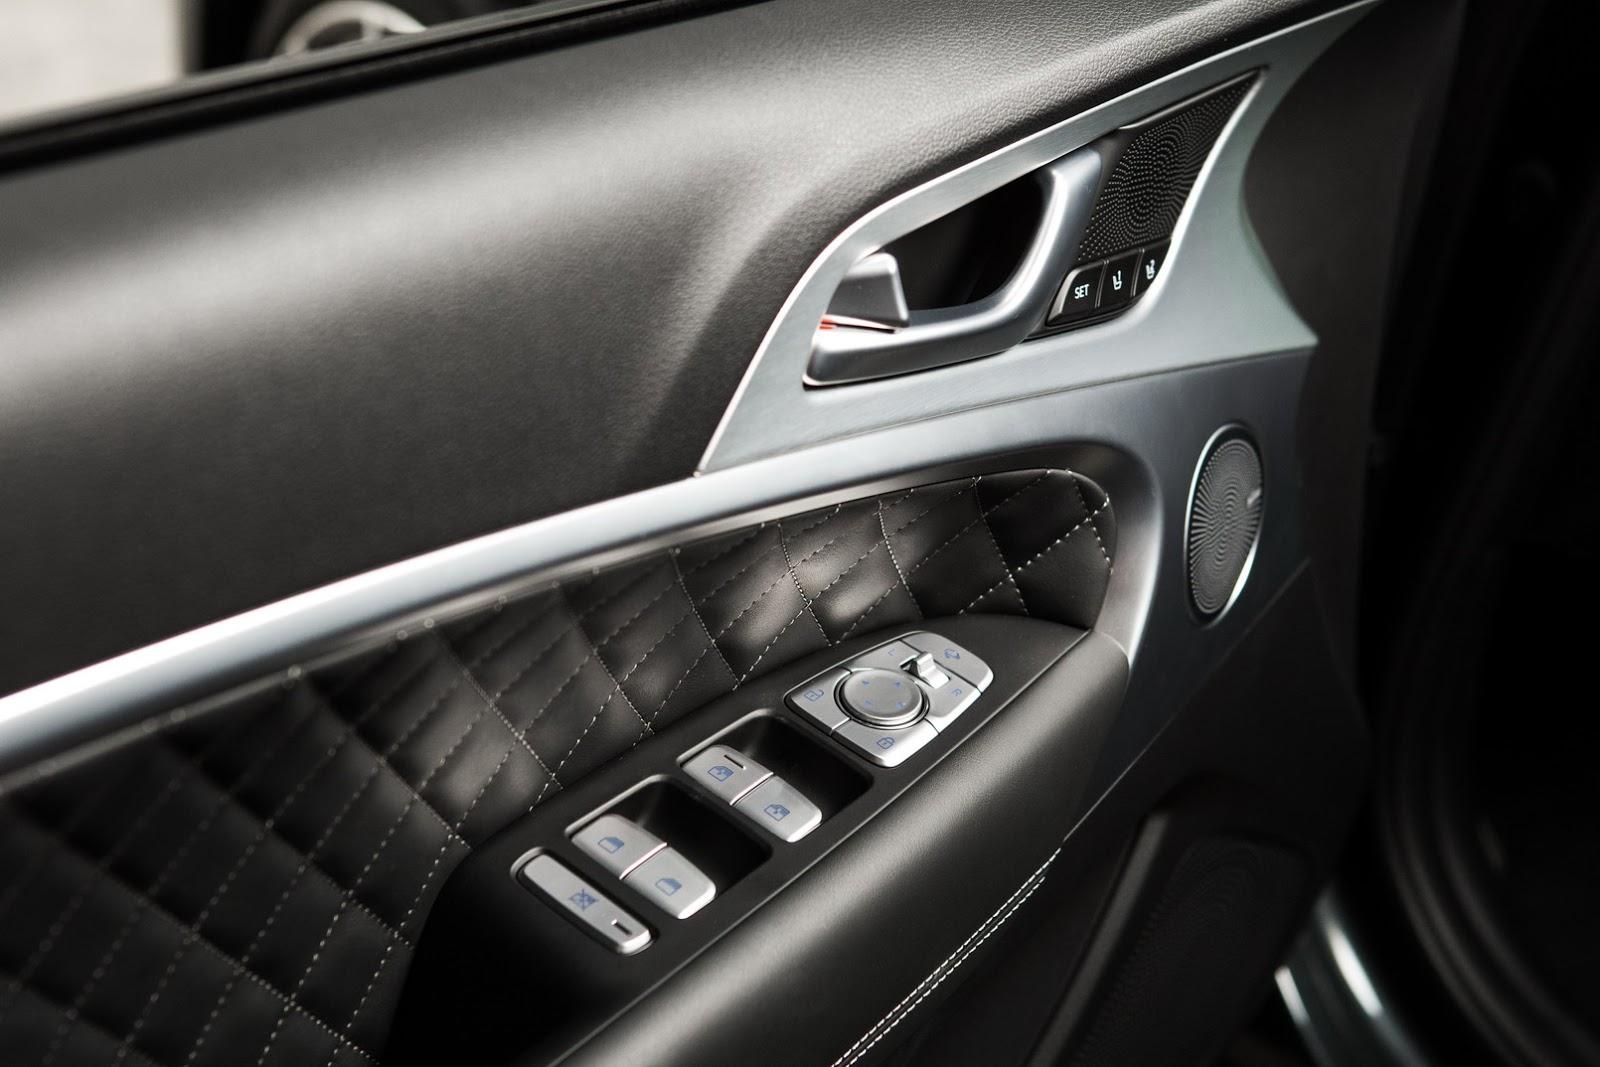 2018 genesis g70 sports sedan goes official looks fairly premium autoevolution. Black Bedroom Furniture Sets. Home Design Ideas